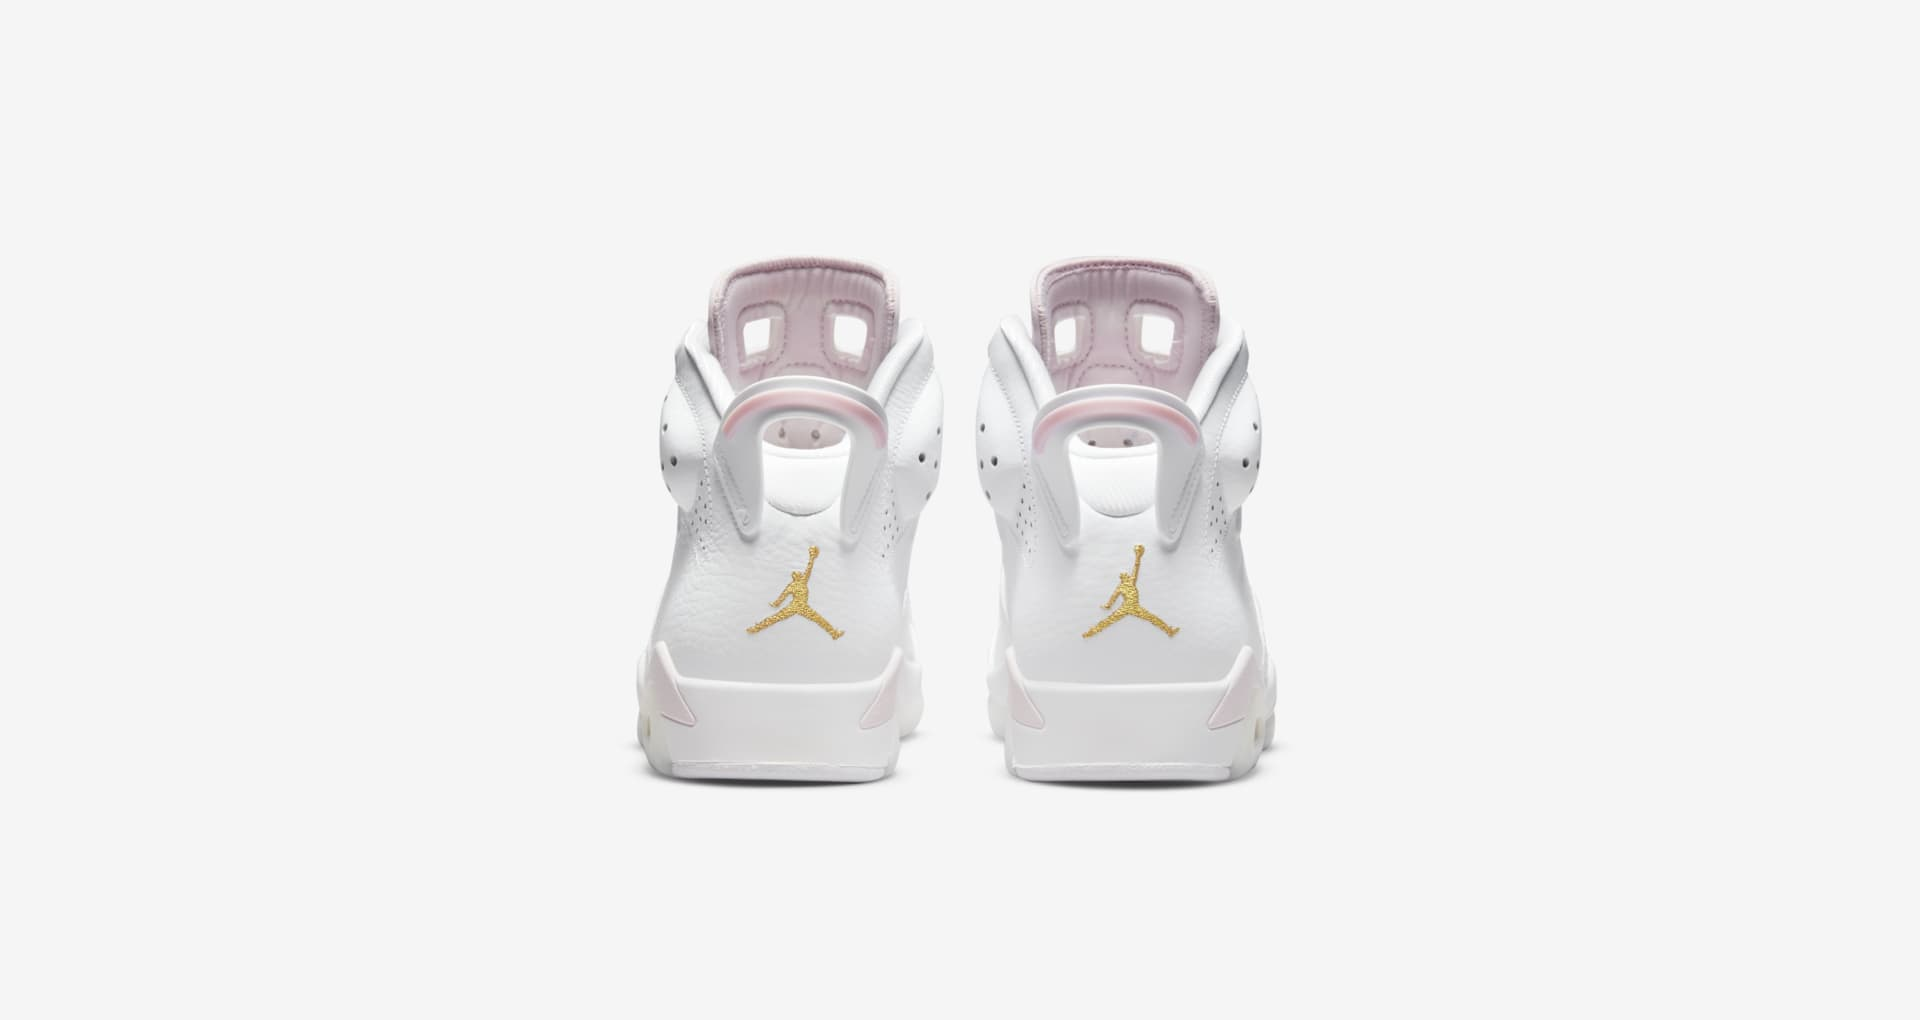 Jordan,Air Jordan 6,AJ6,Gold H  金色吊坠点缀!全新 Air Jordan 6 即将发售!